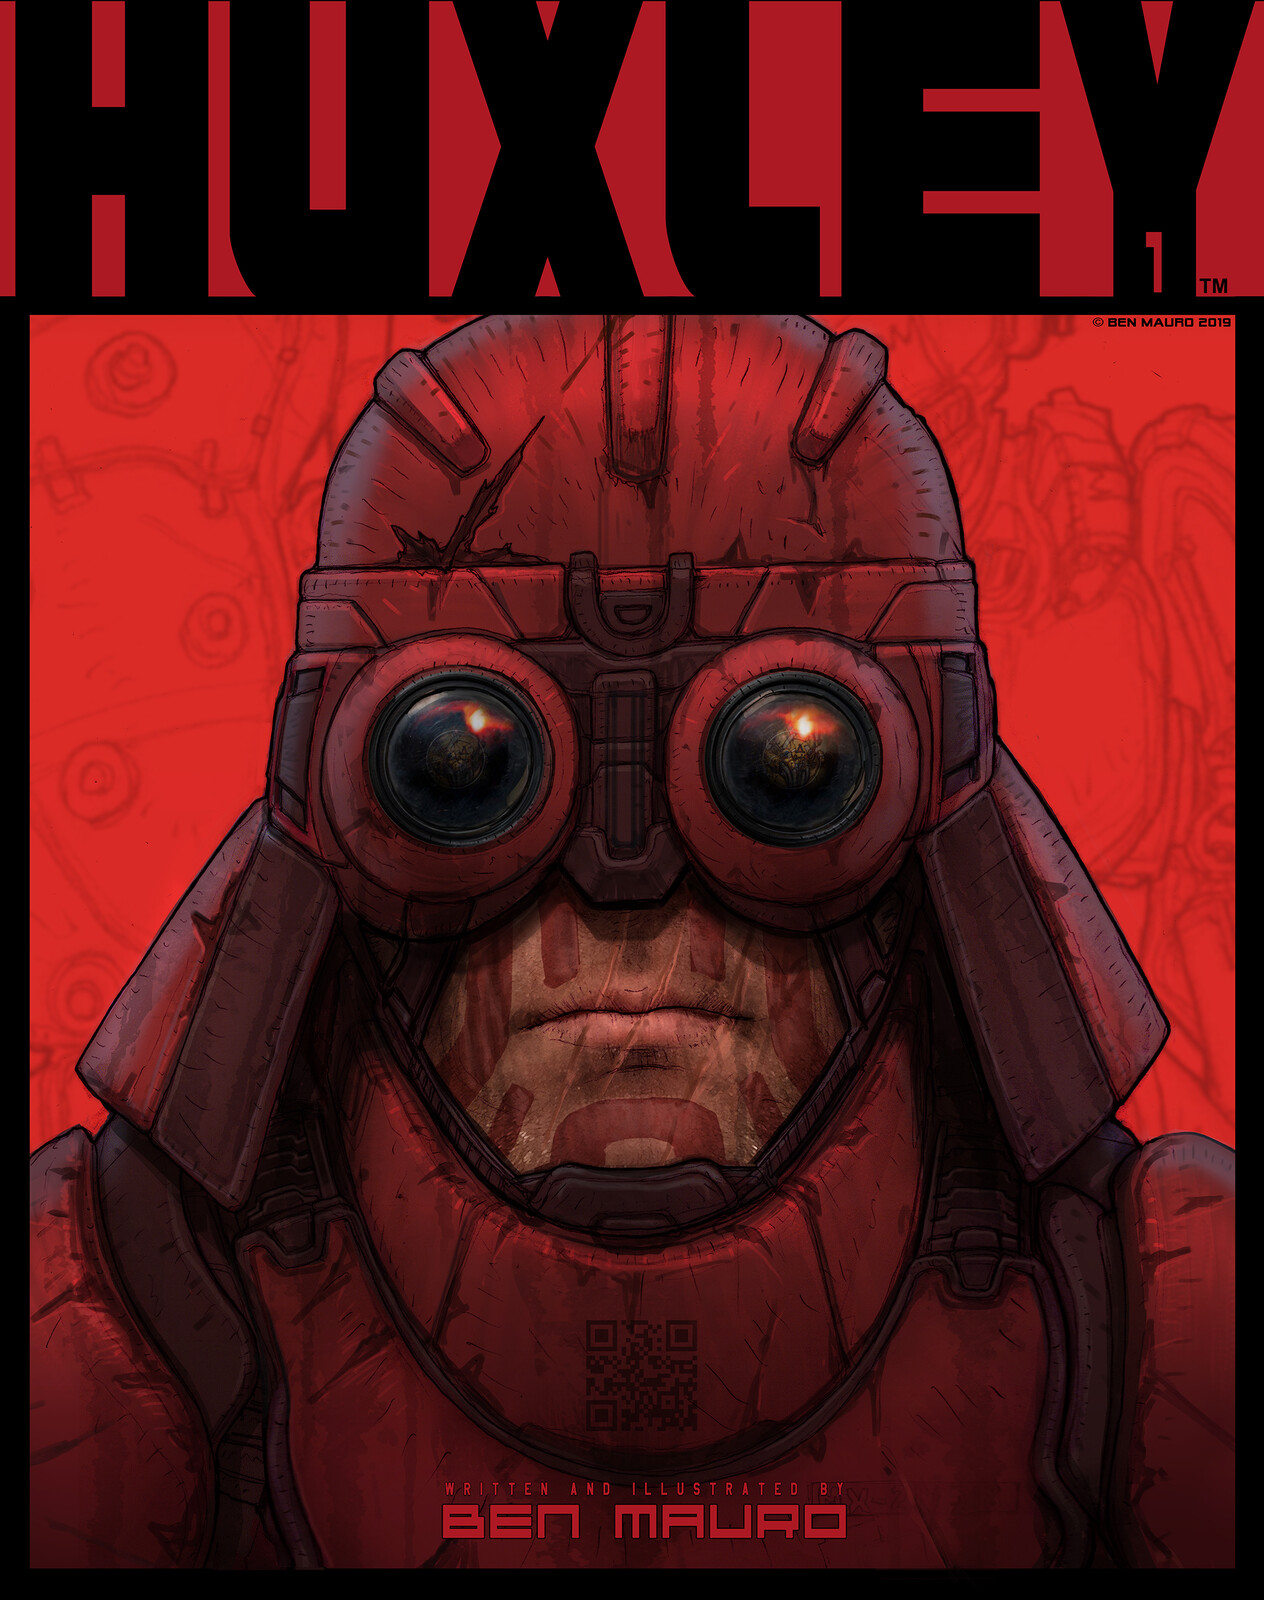 HUXLEY™ GRAPHIC NOVEL Part 1